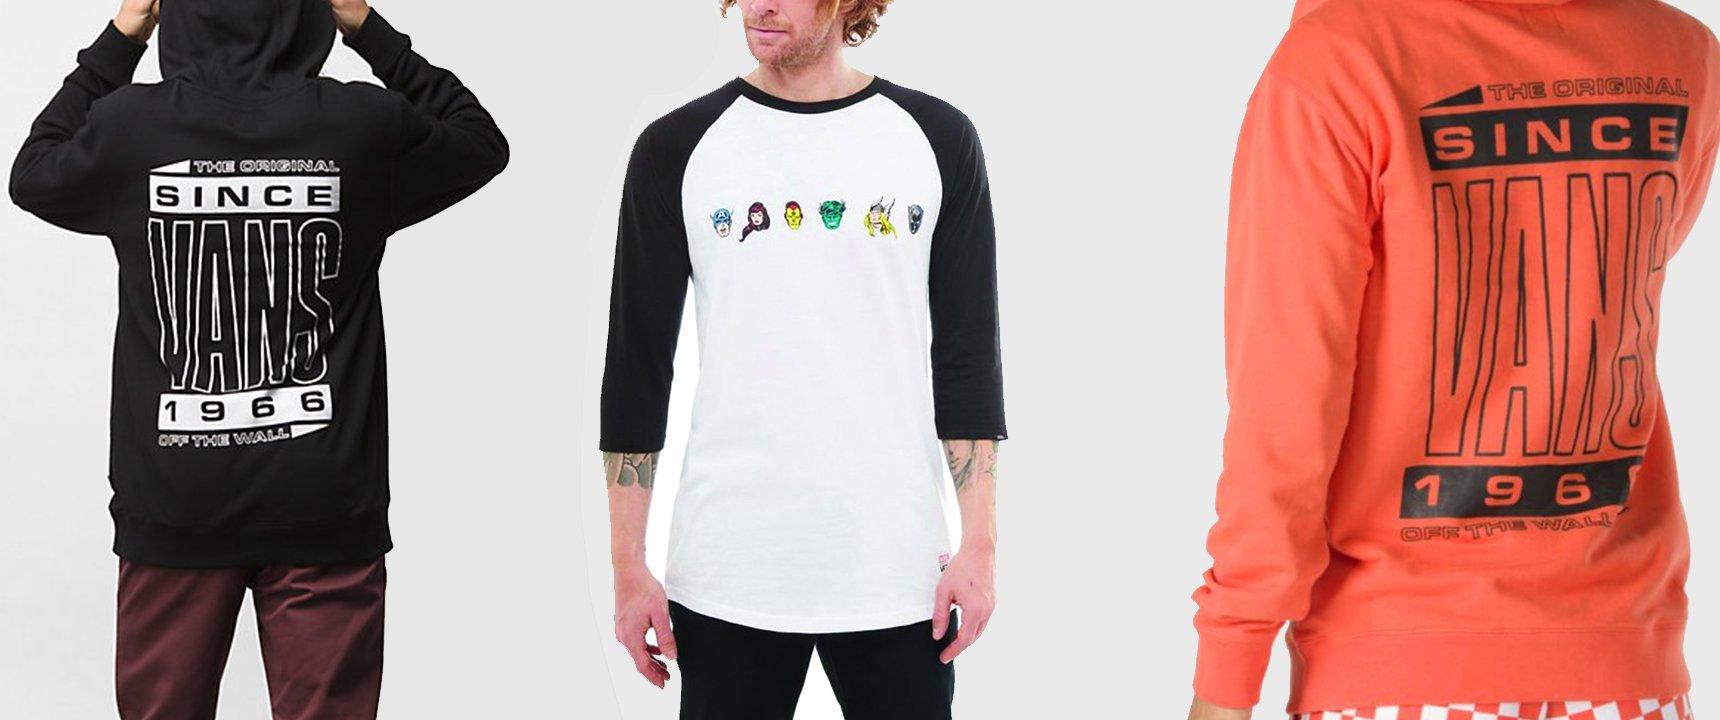 LEONYX branded T-shirts